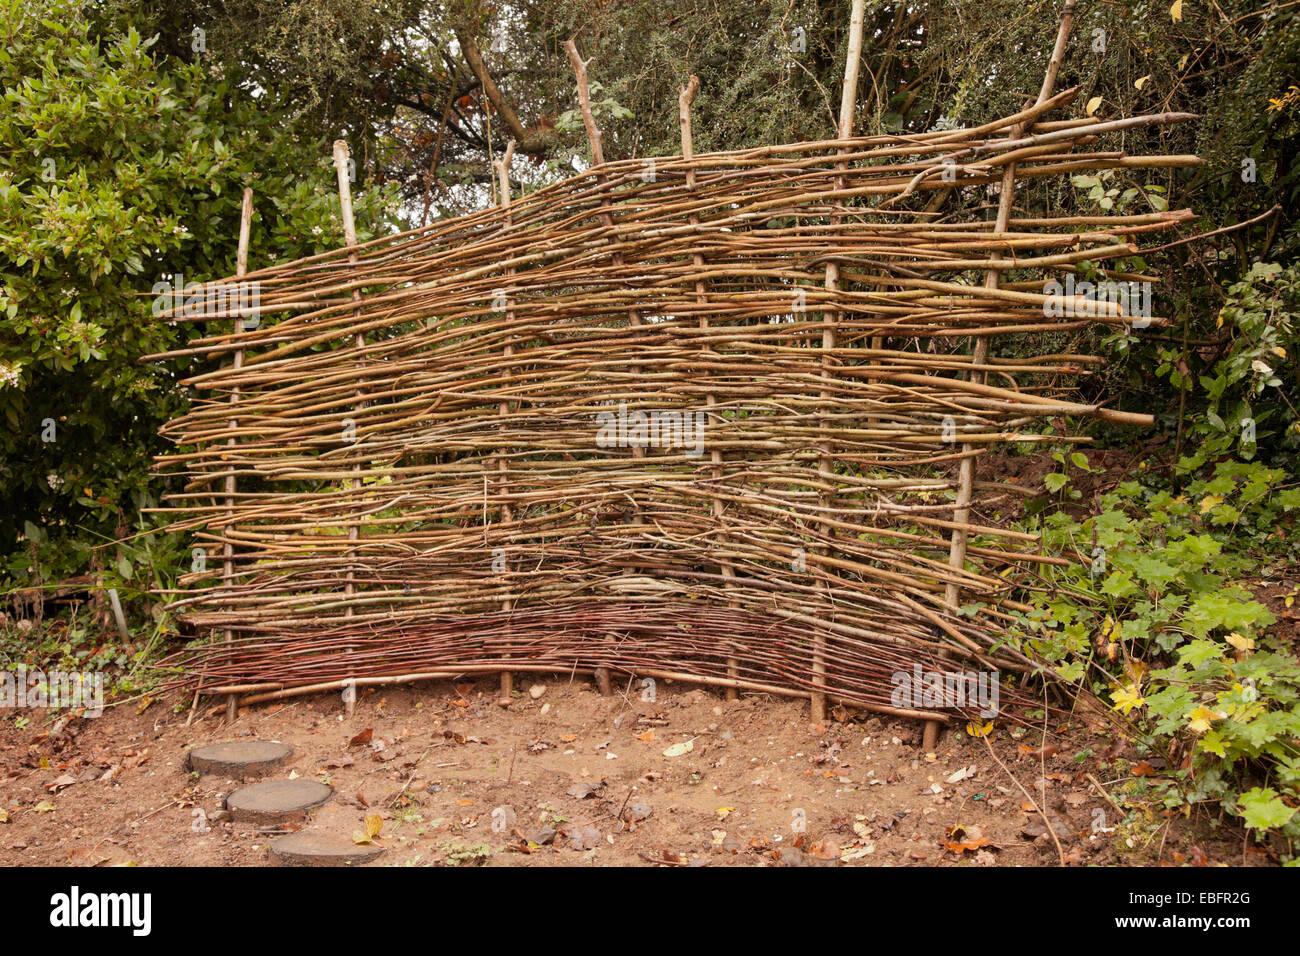 wattle fence example, Avoncroft Museum Bromsgrove Worcs UK - Stock Image